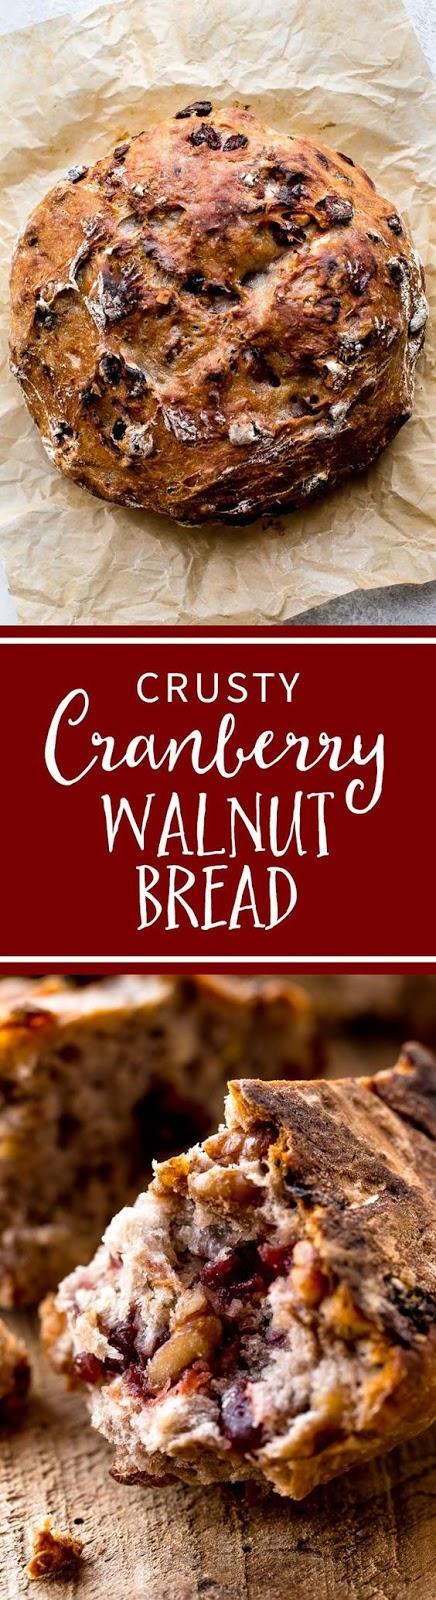 Crusty Cranberry Nut No Knead Bread